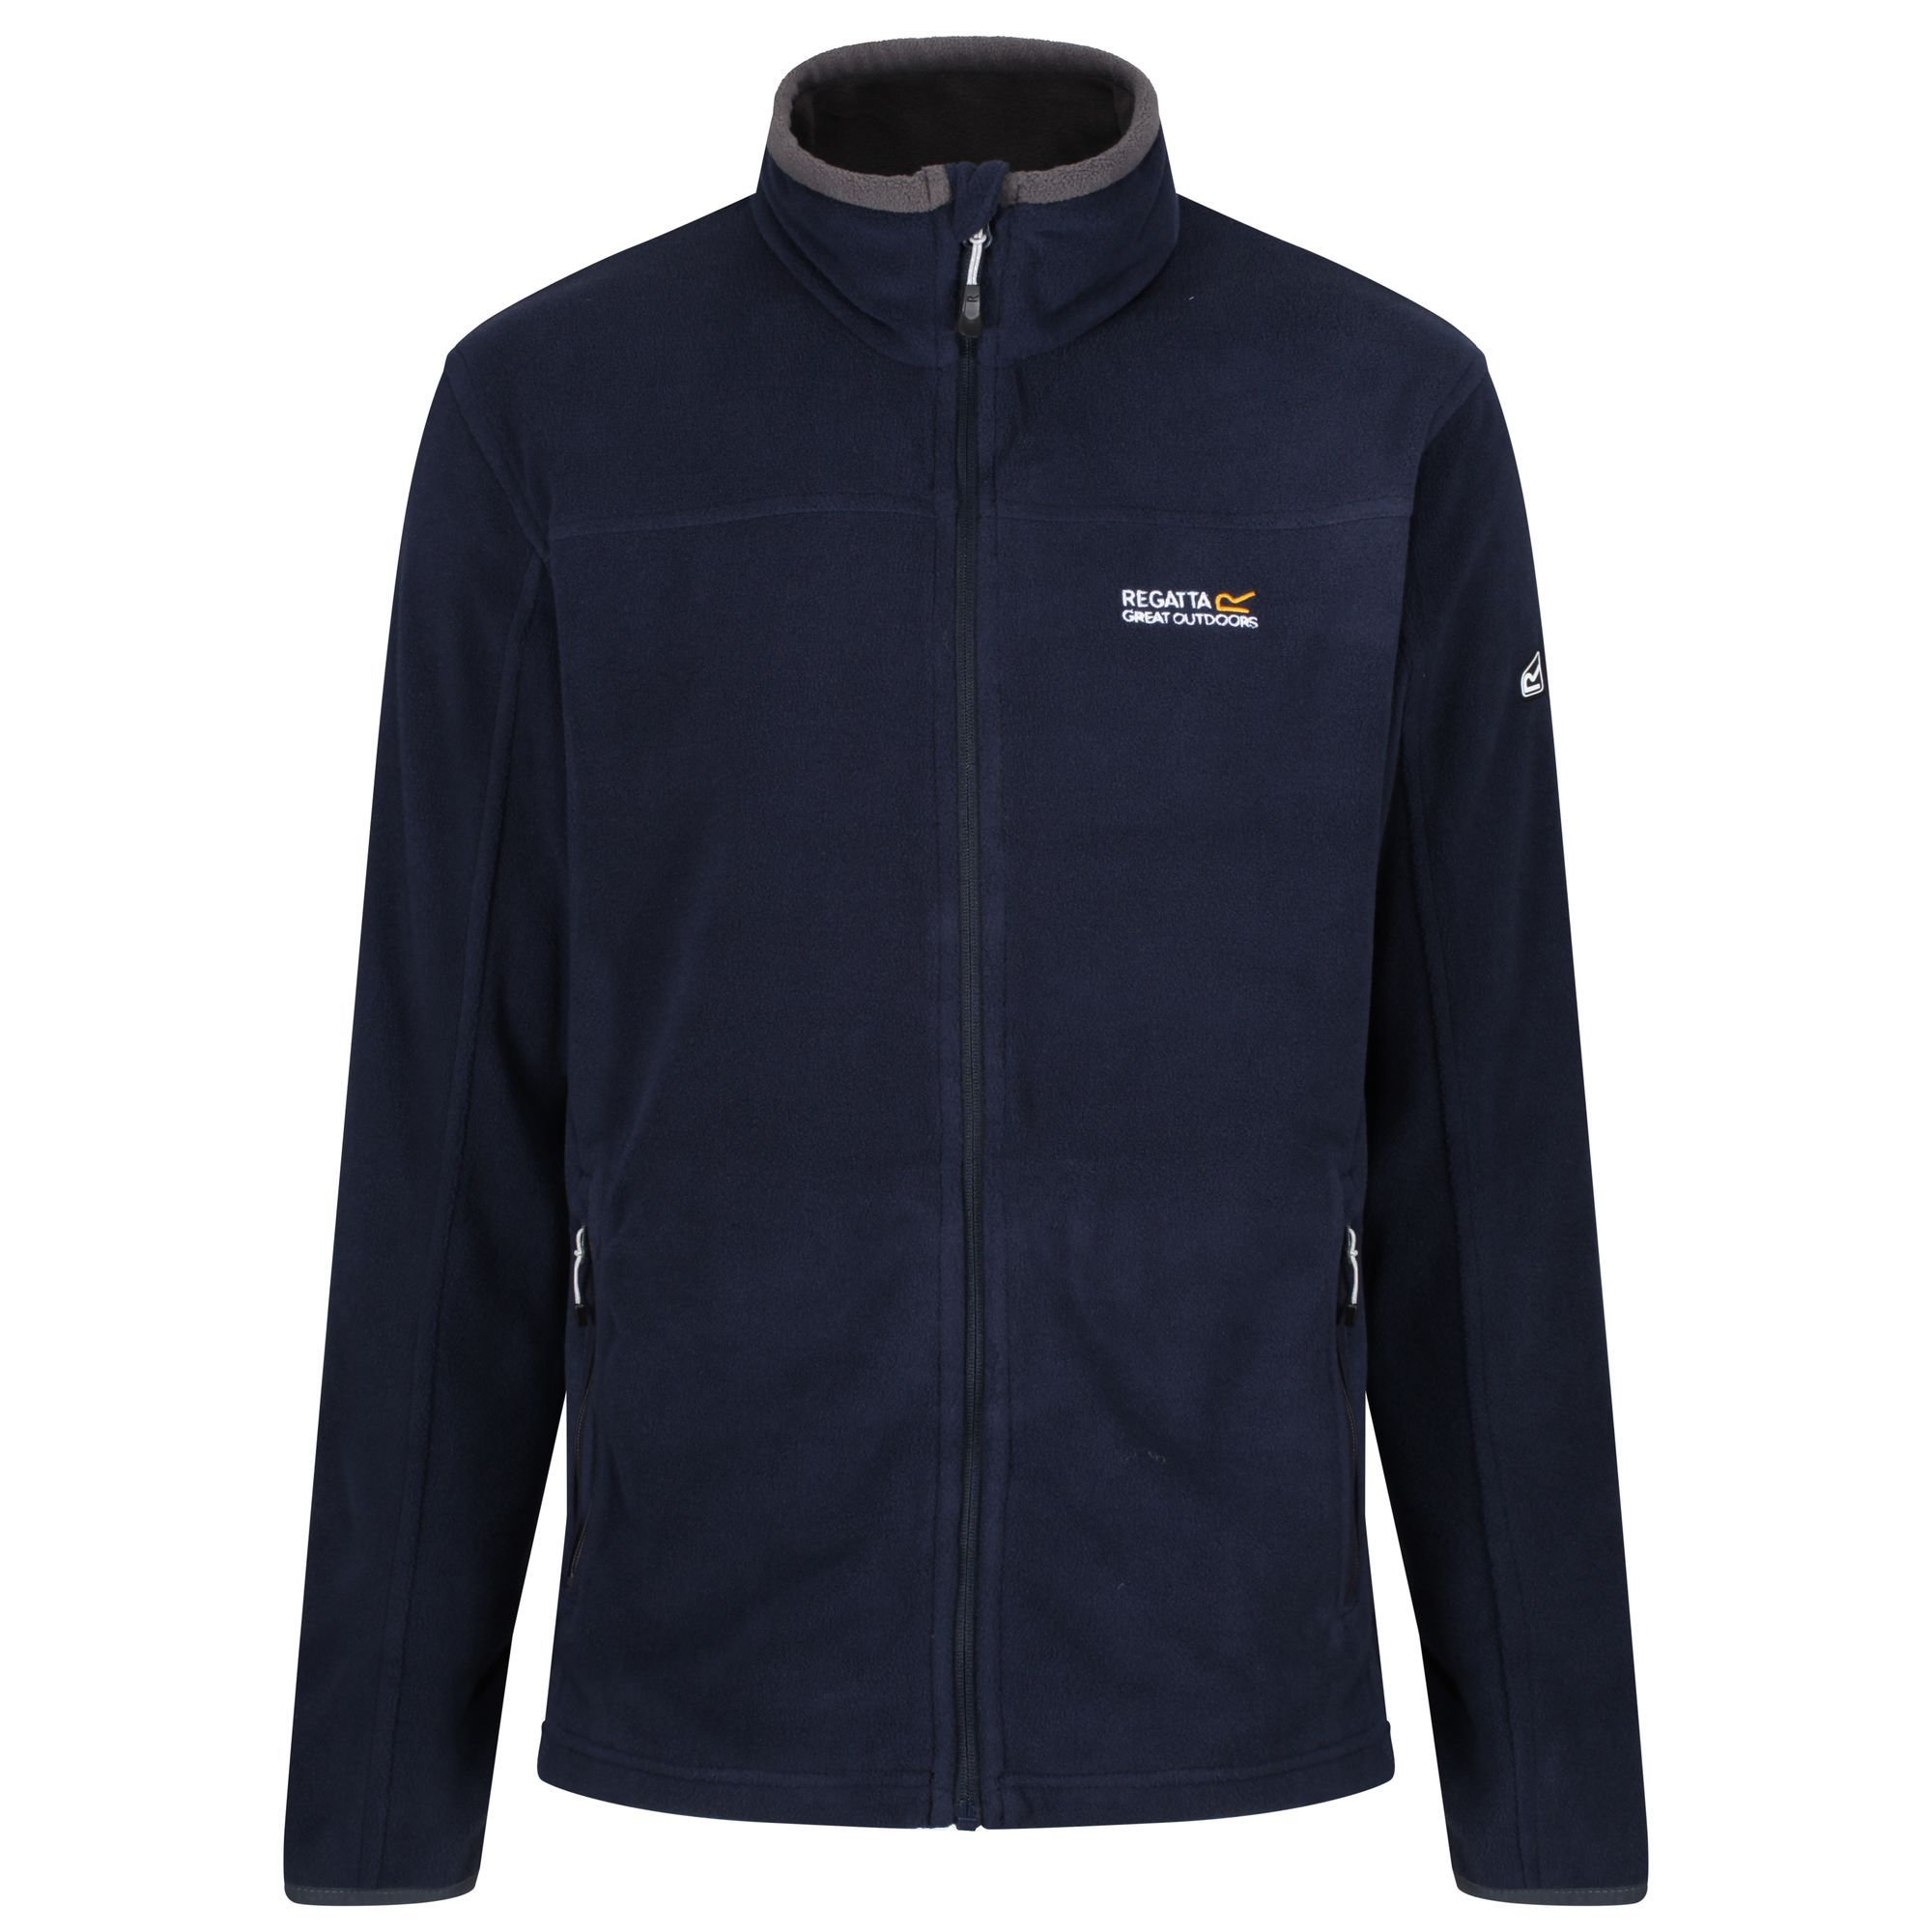 thumbnail 13 - Regatta Fellard Mens Lightweight Full Zip Warm Walking Fleece Jacket RRP £30